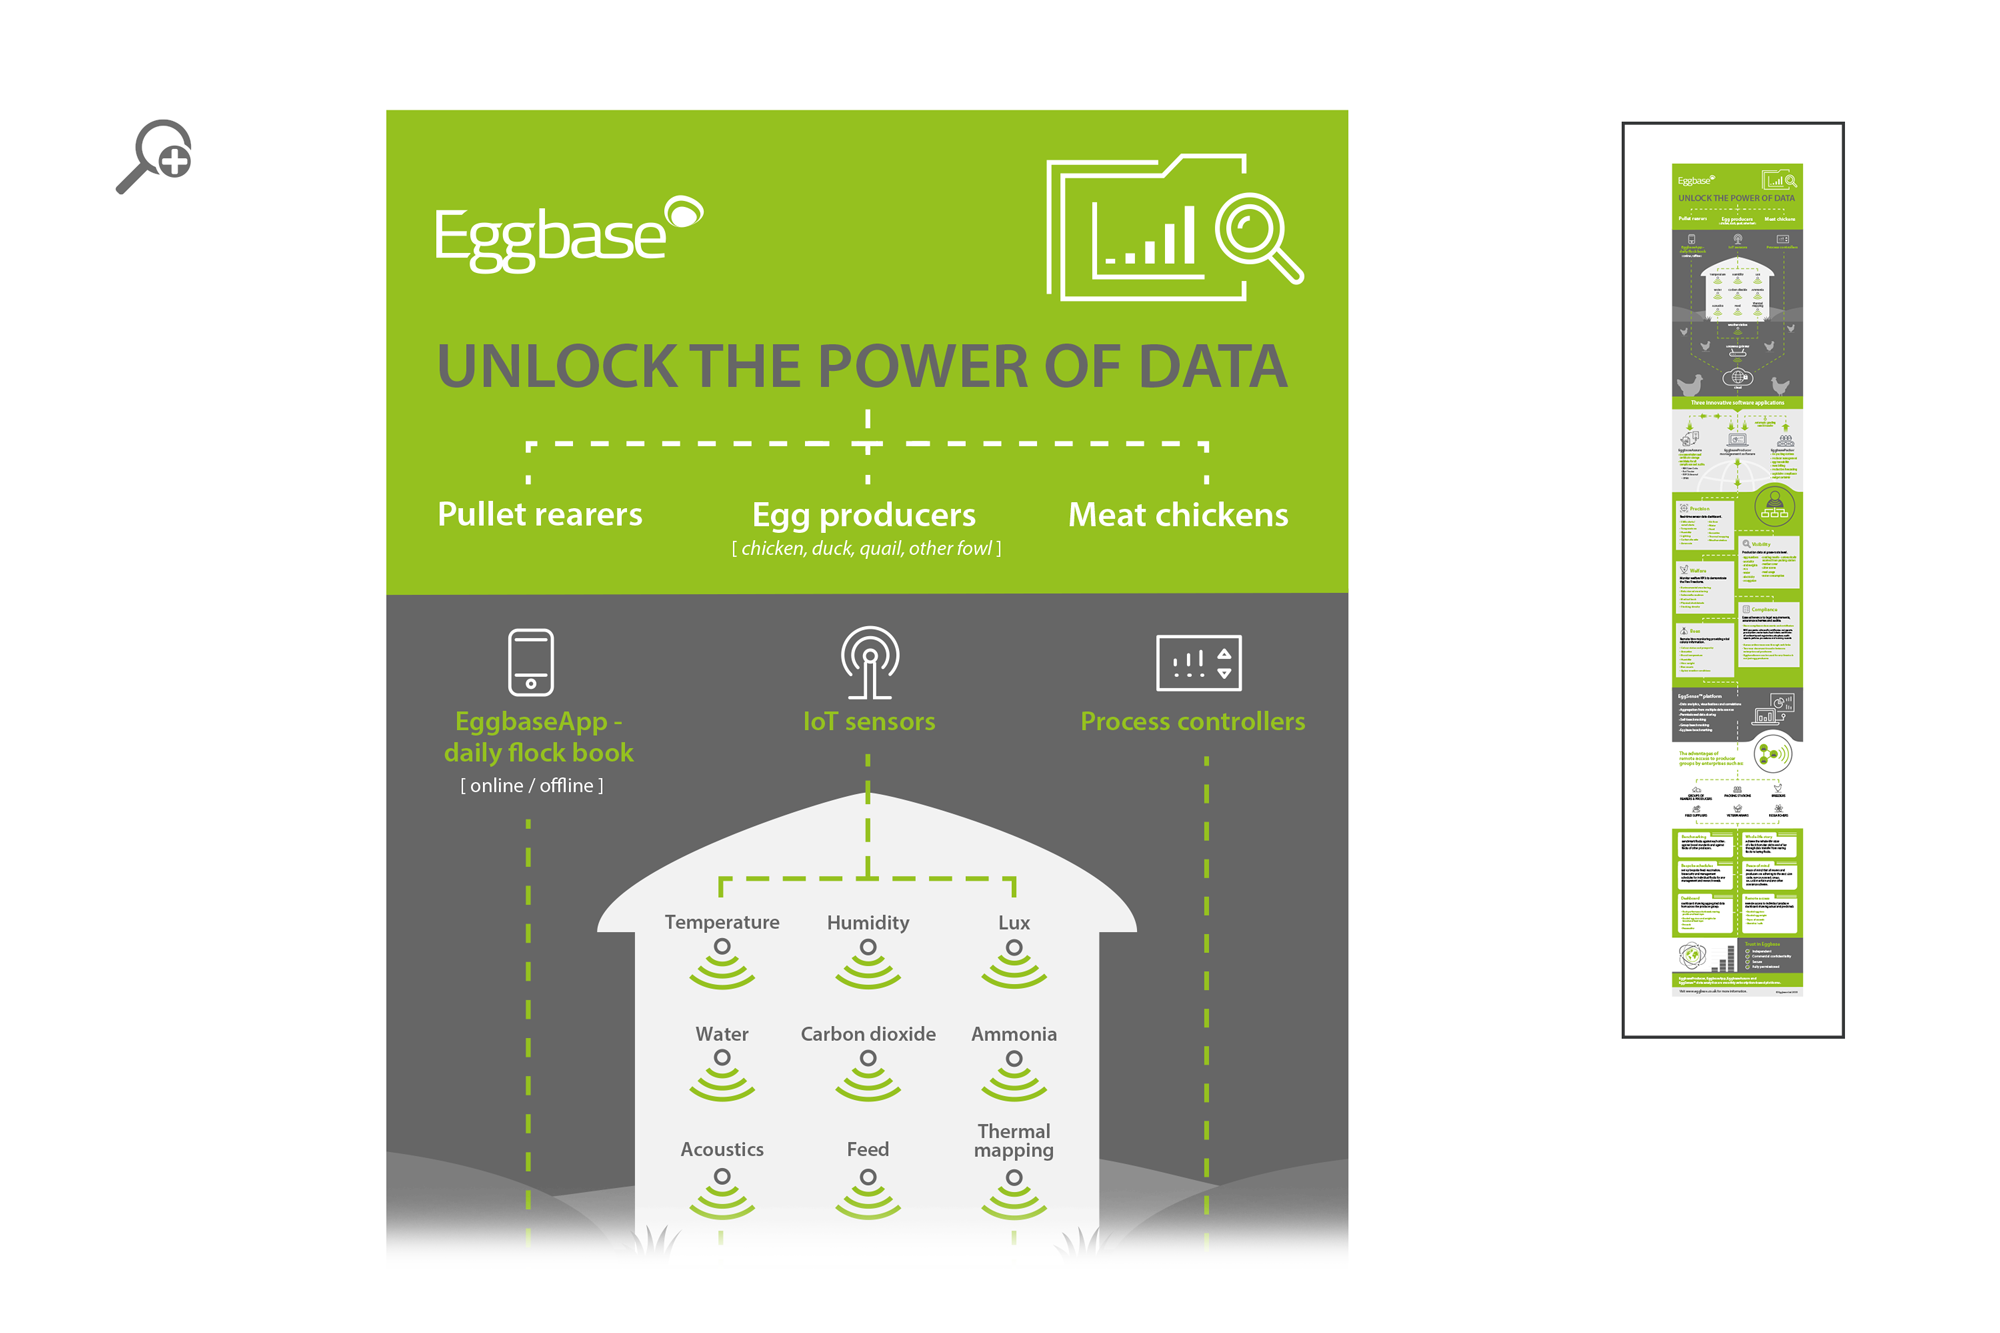 Eggbase Infographic